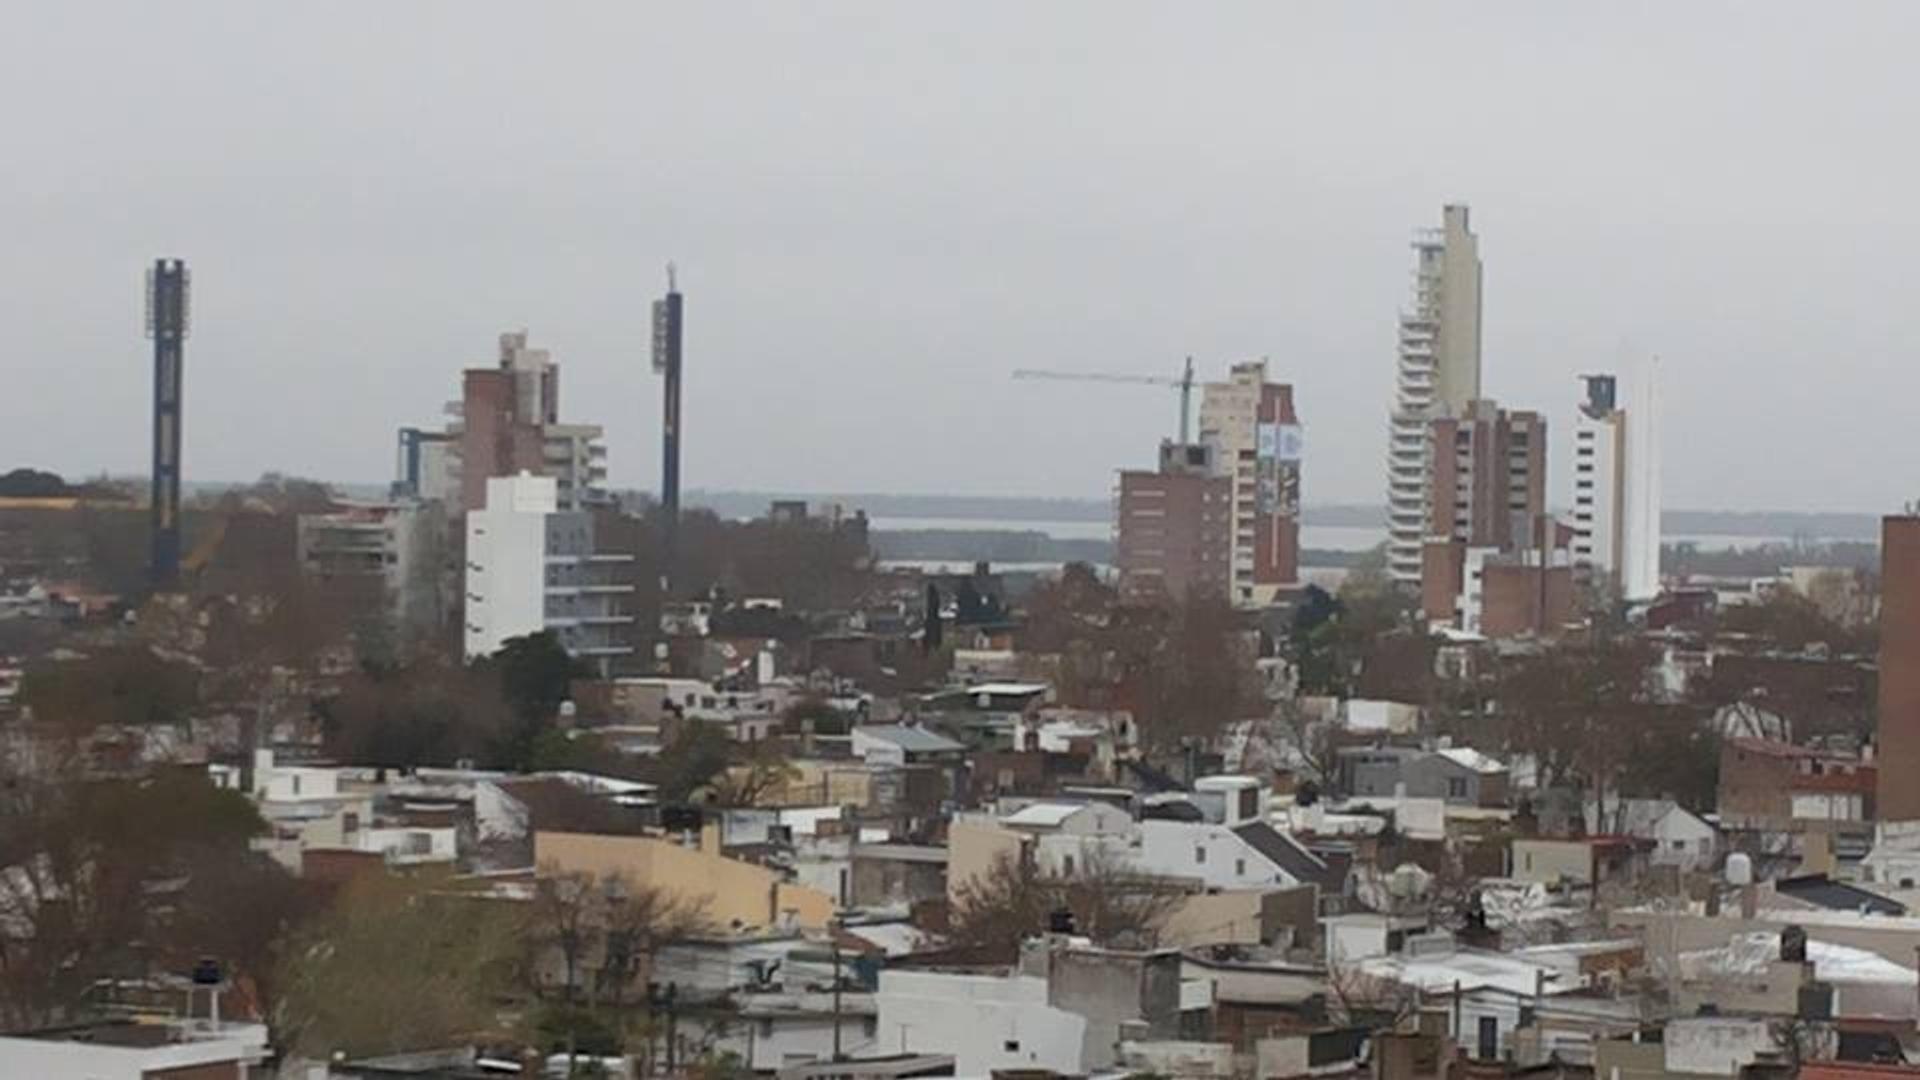 ARROYITO - AV. ALBERDI 600 bis - Hermoso depto. (2 Dorm.), c / COCHERAS (1 o 2). - Vista despejada. - Foto 14